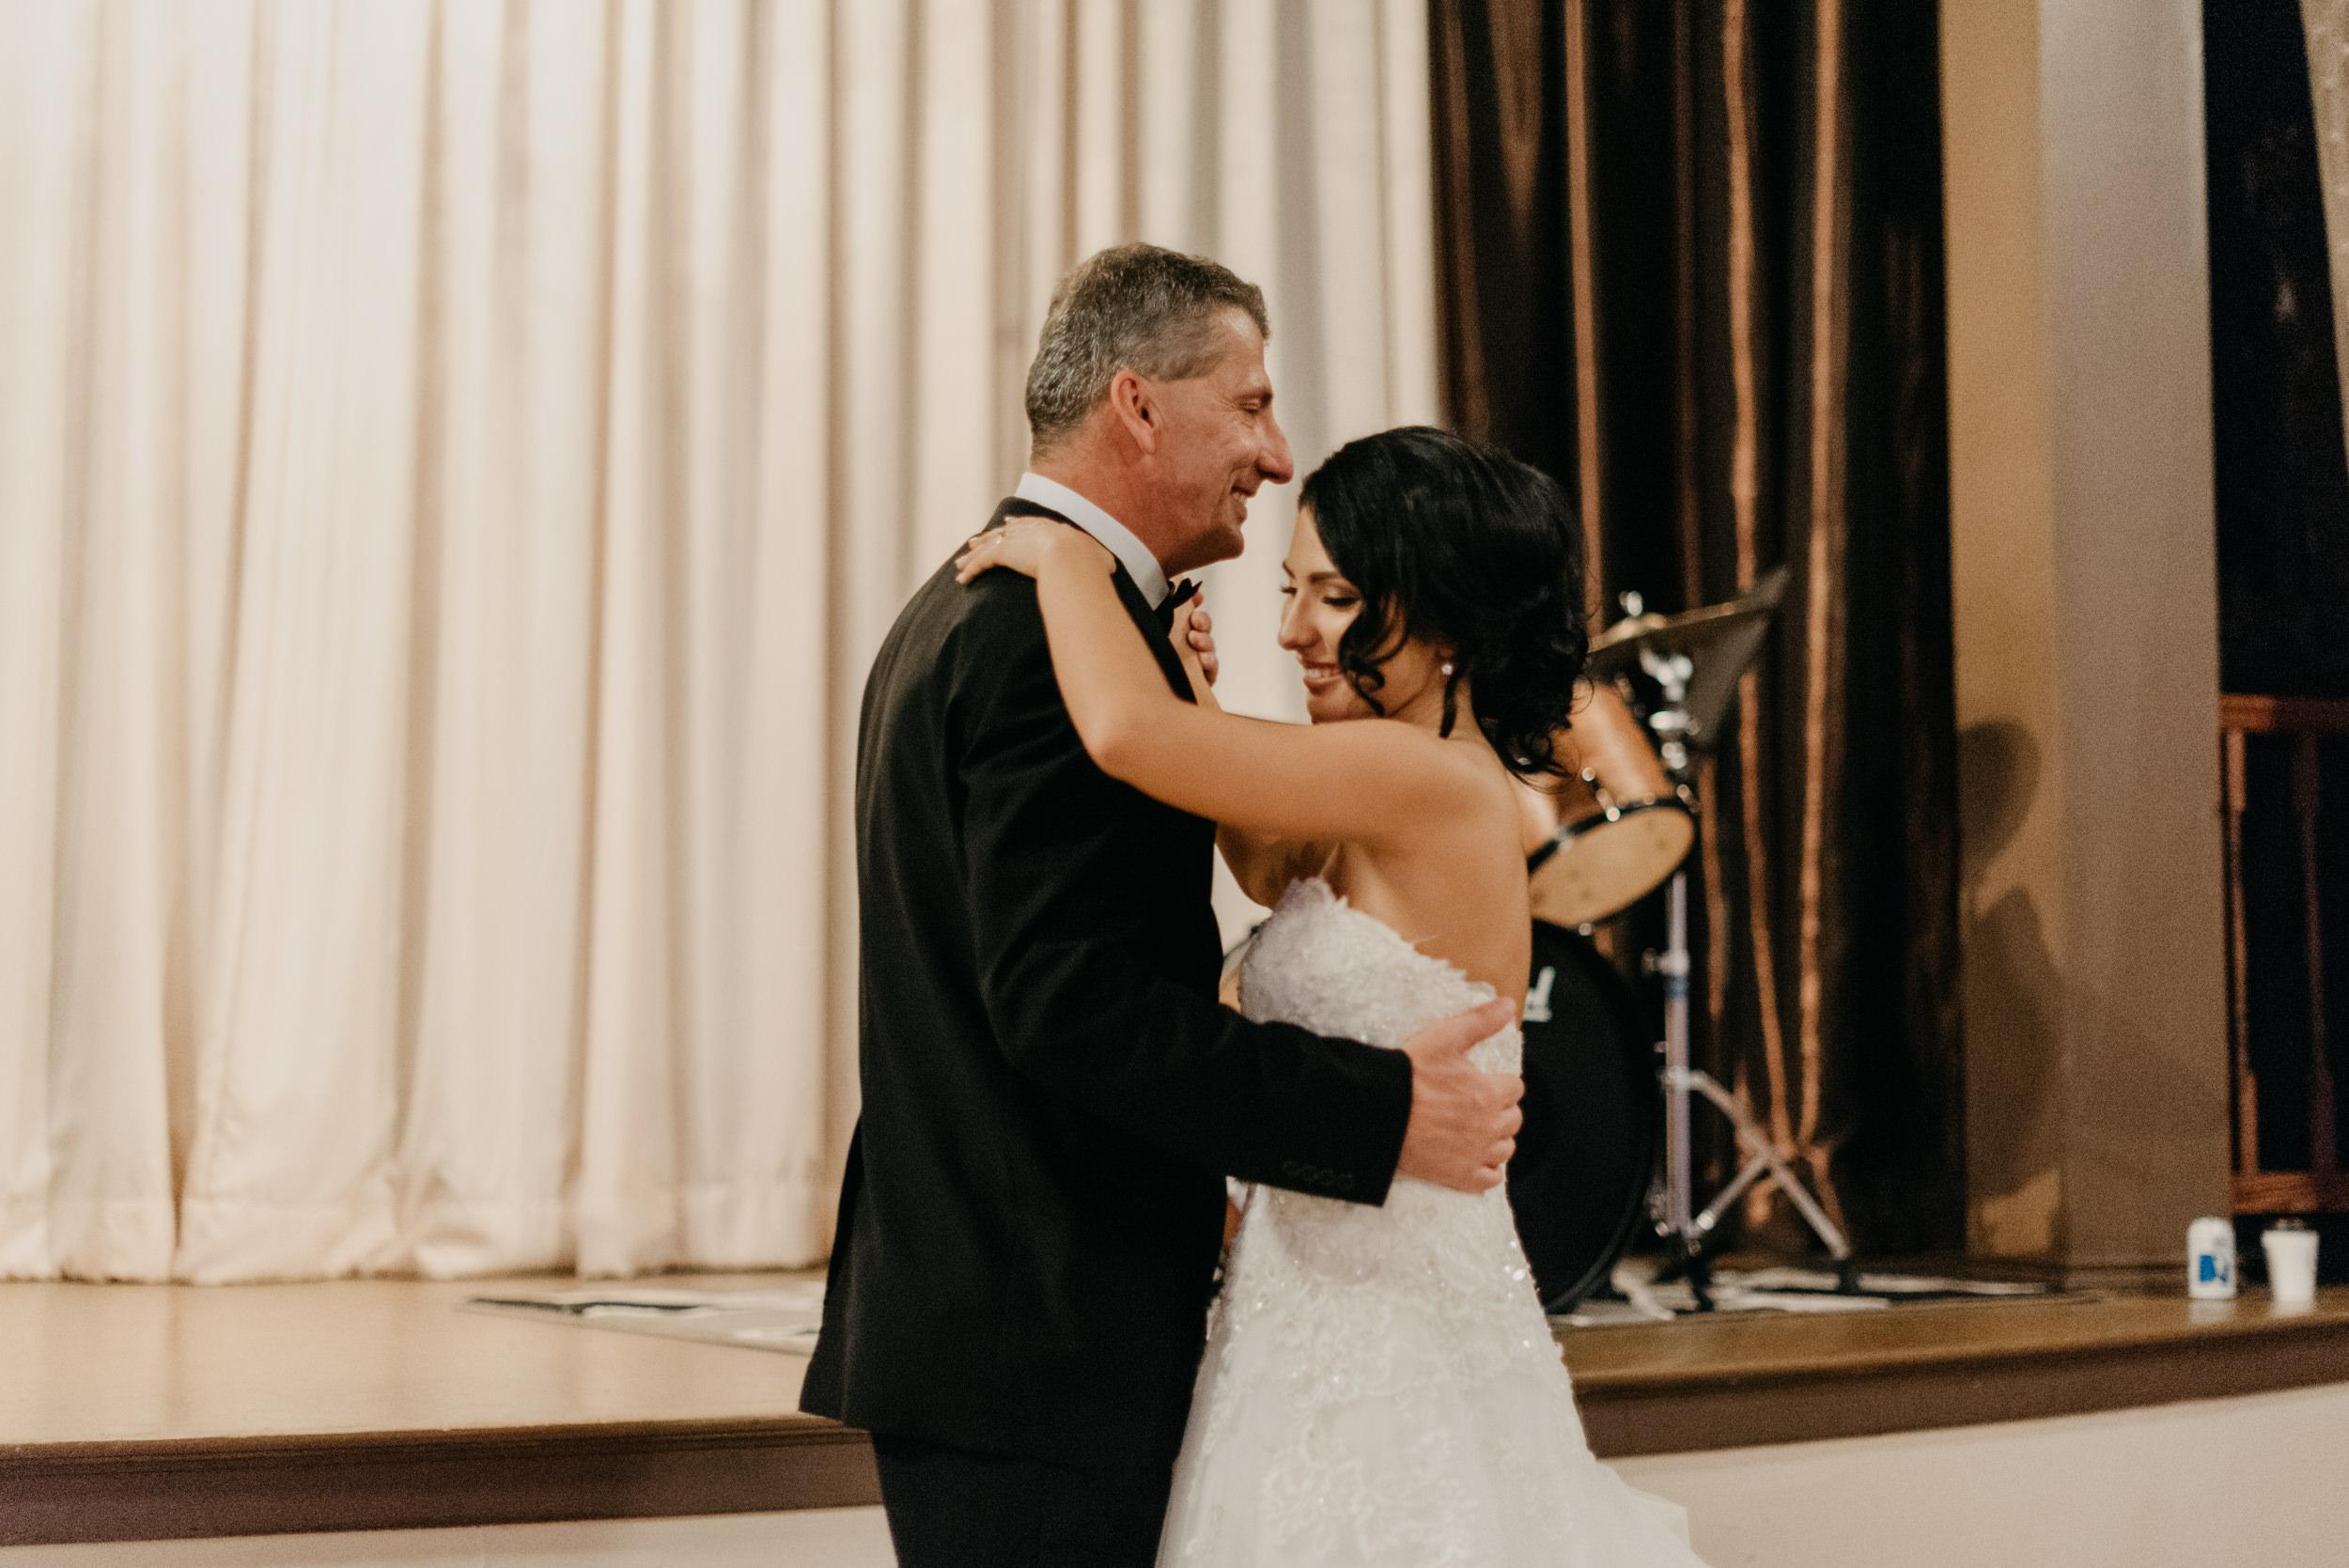 115-reception-west-end-ballroom-portland-wedding-photographer-9649.jpg